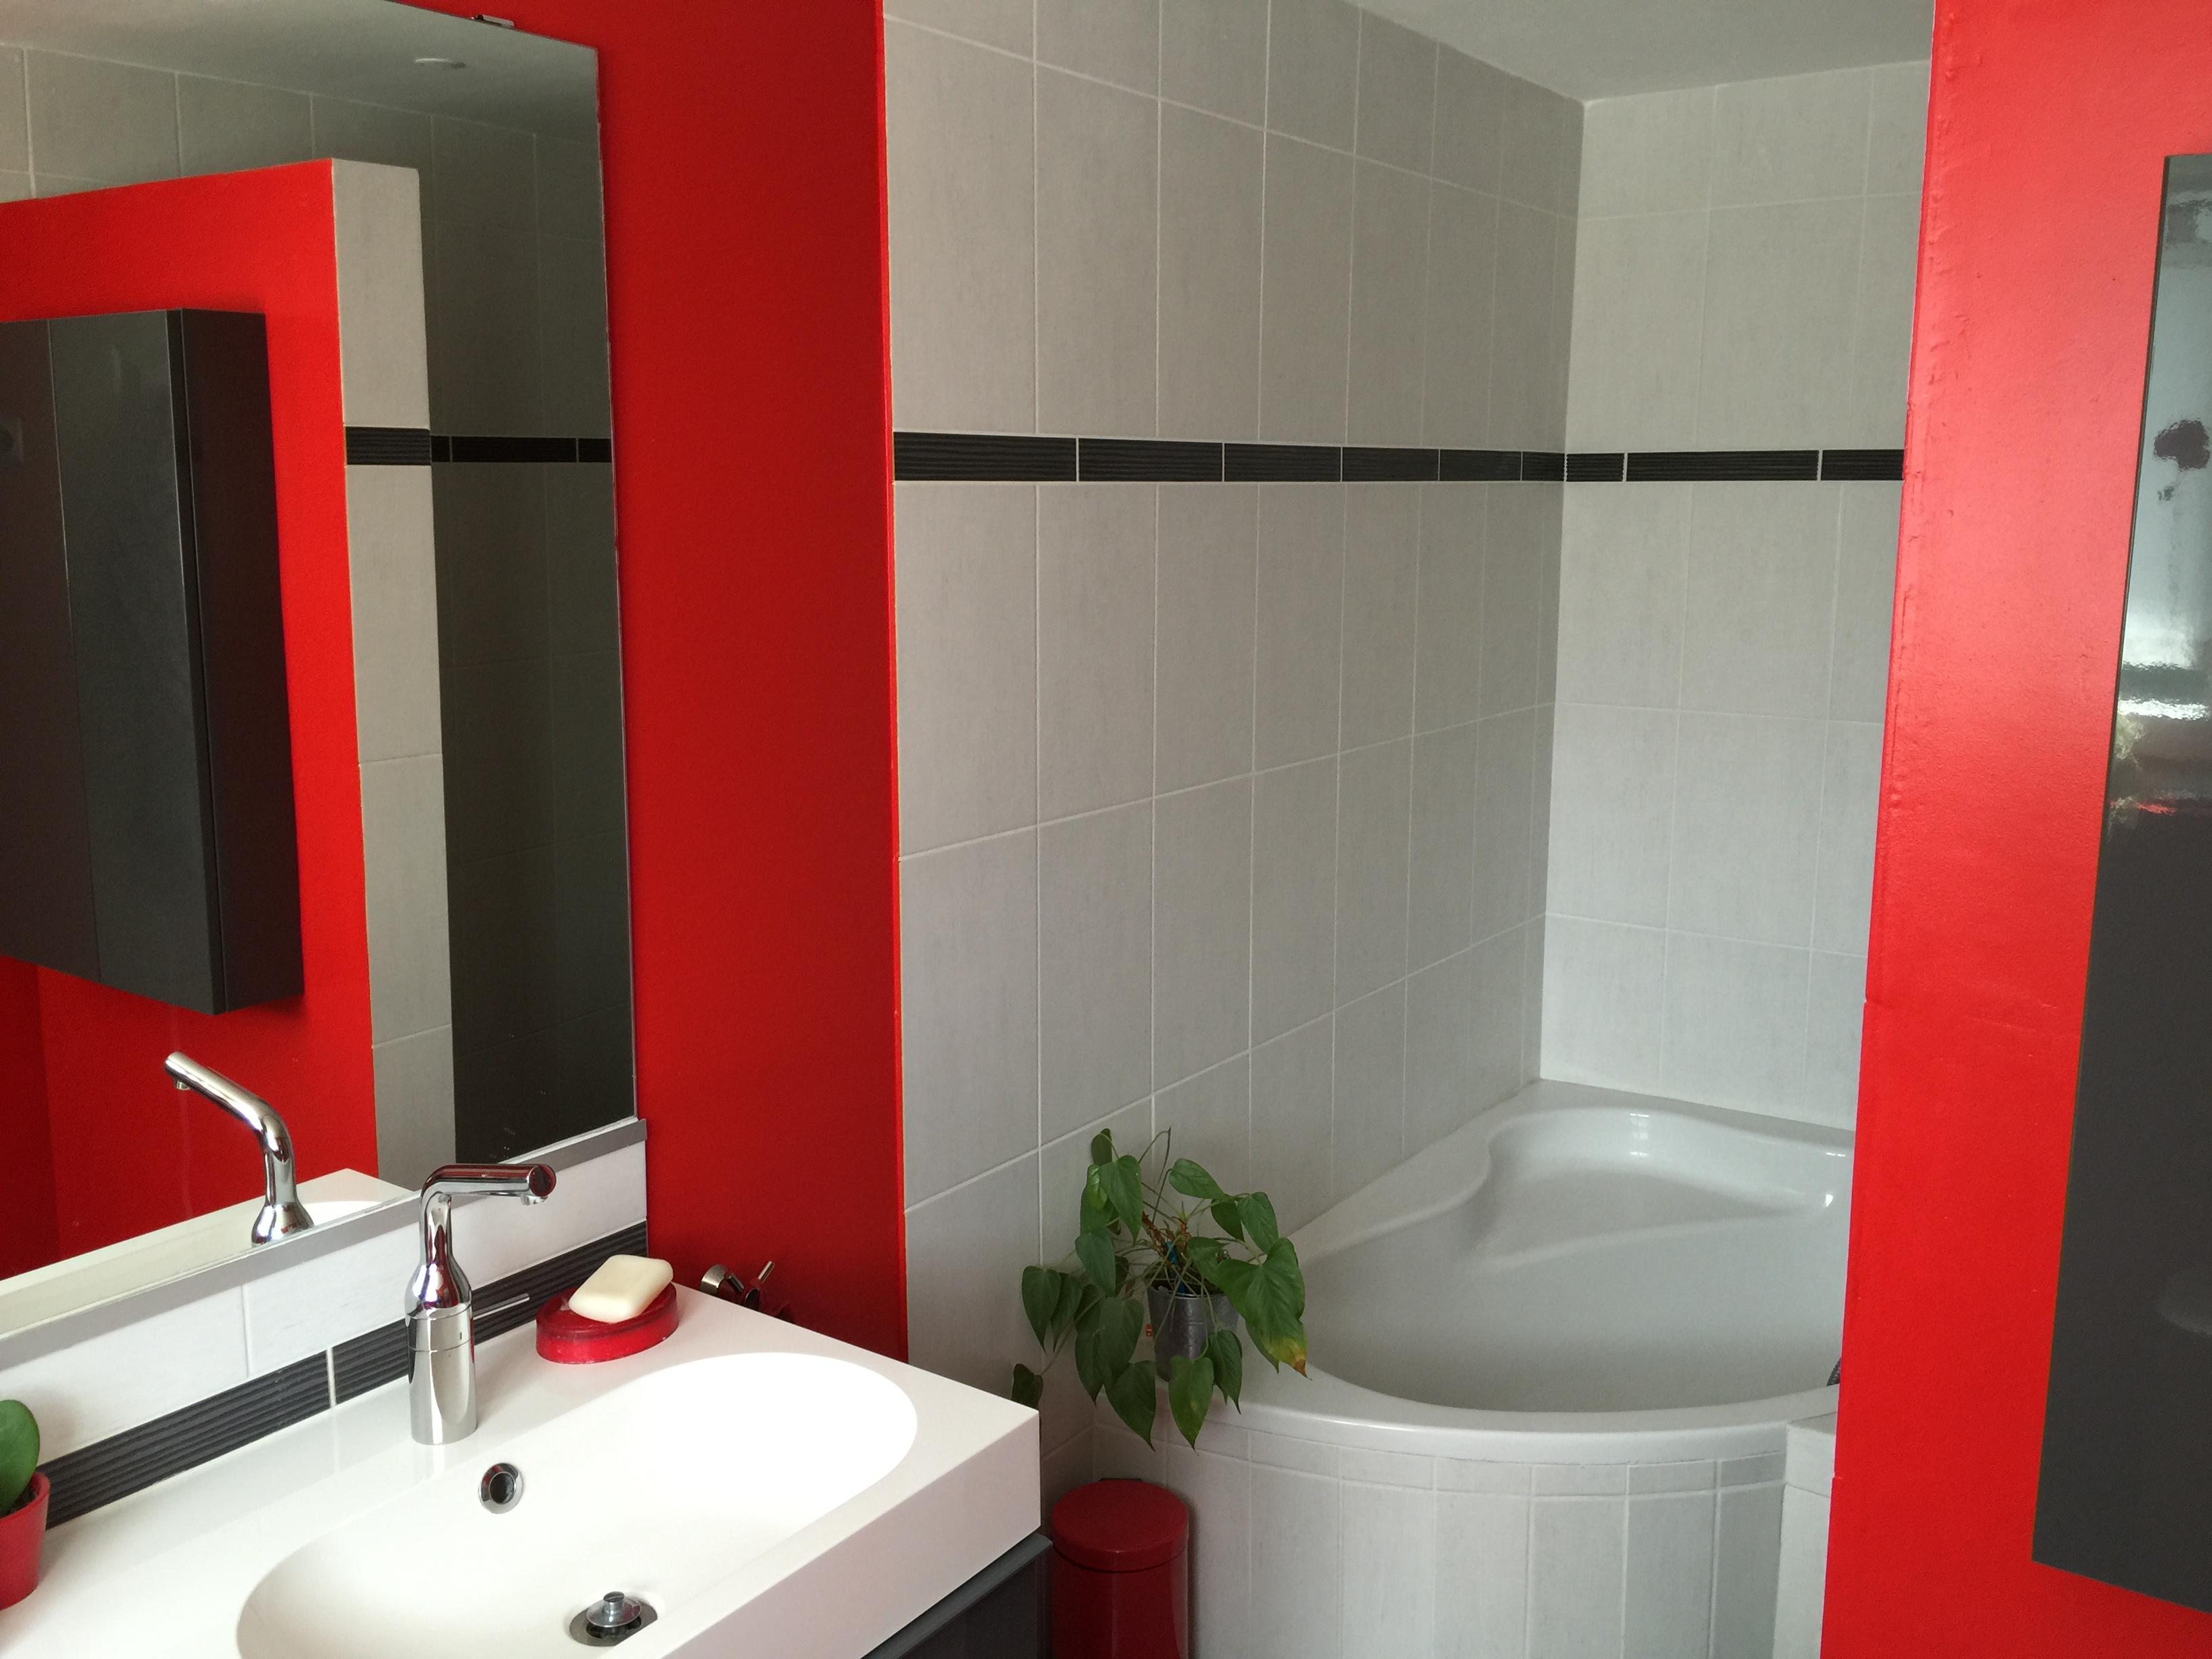 accueil habitat conseil r novation. Black Bedroom Furniture Sets. Home Design Ideas